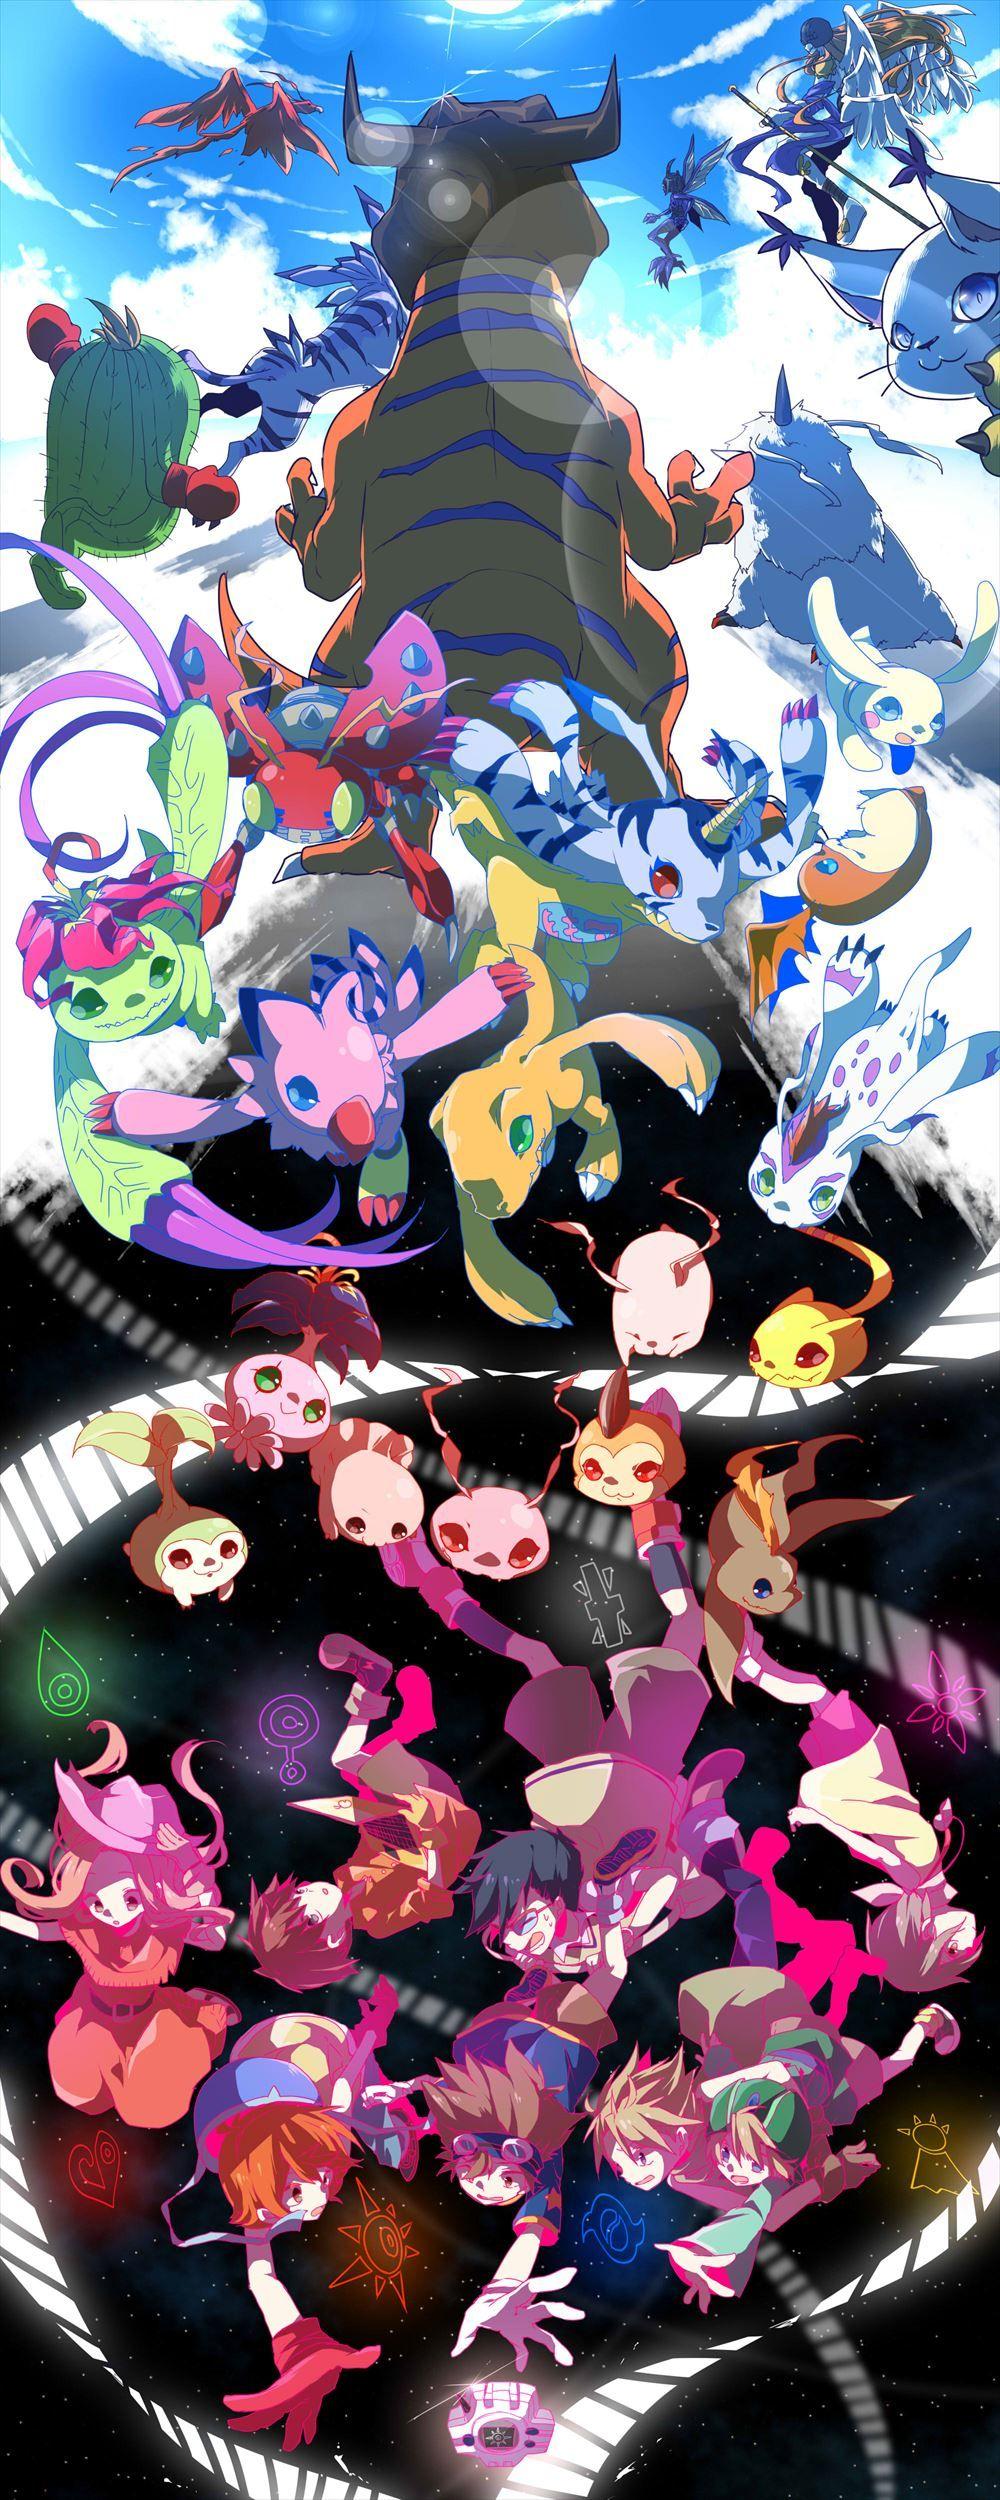 Digimon adventure the art is beautiful gatomon in the